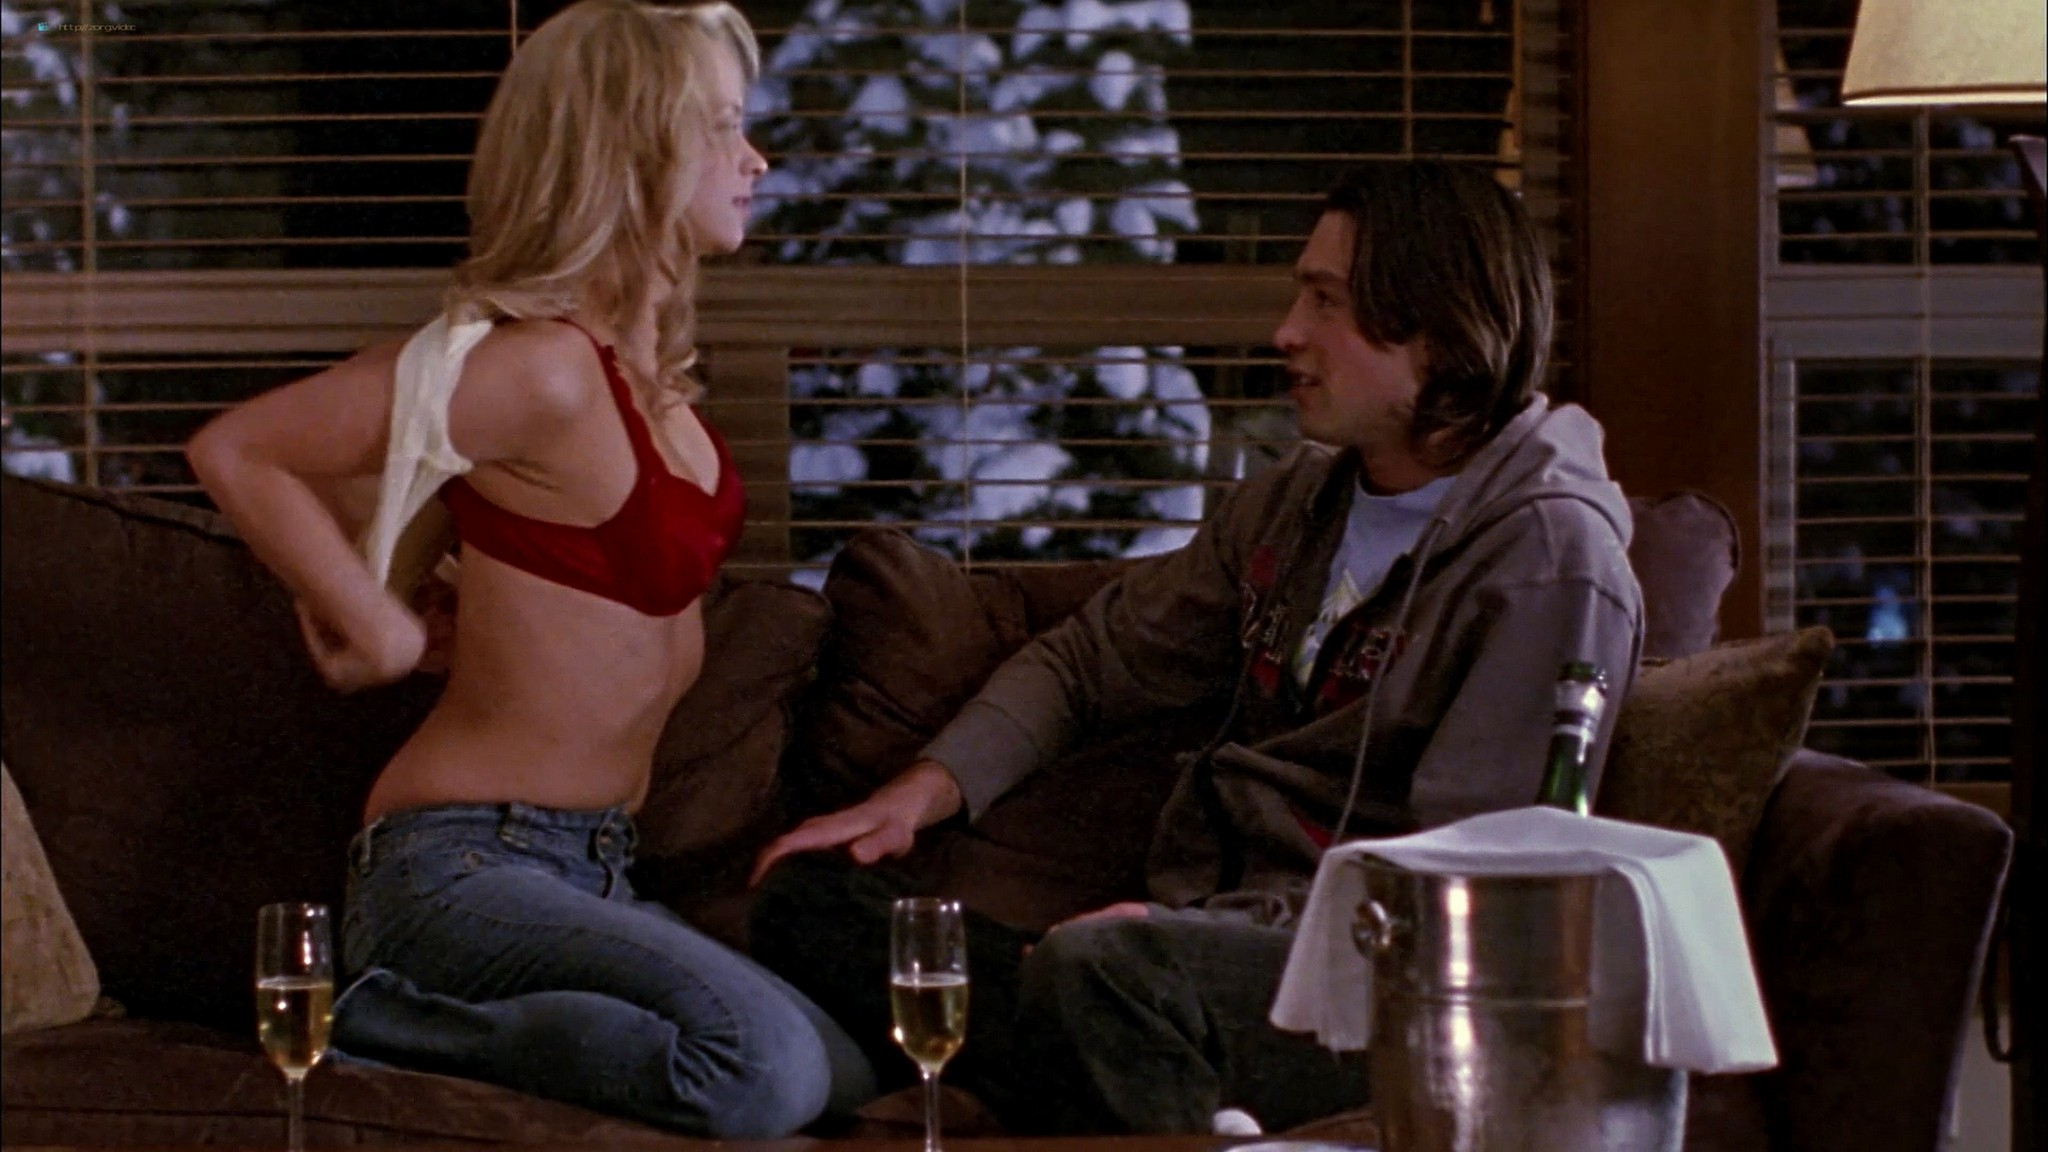 Lindsay Maxwell nude Amber Borycki sexy - Revenge of the Boarding School Dropouts (2009) HD 1080p Web (12)